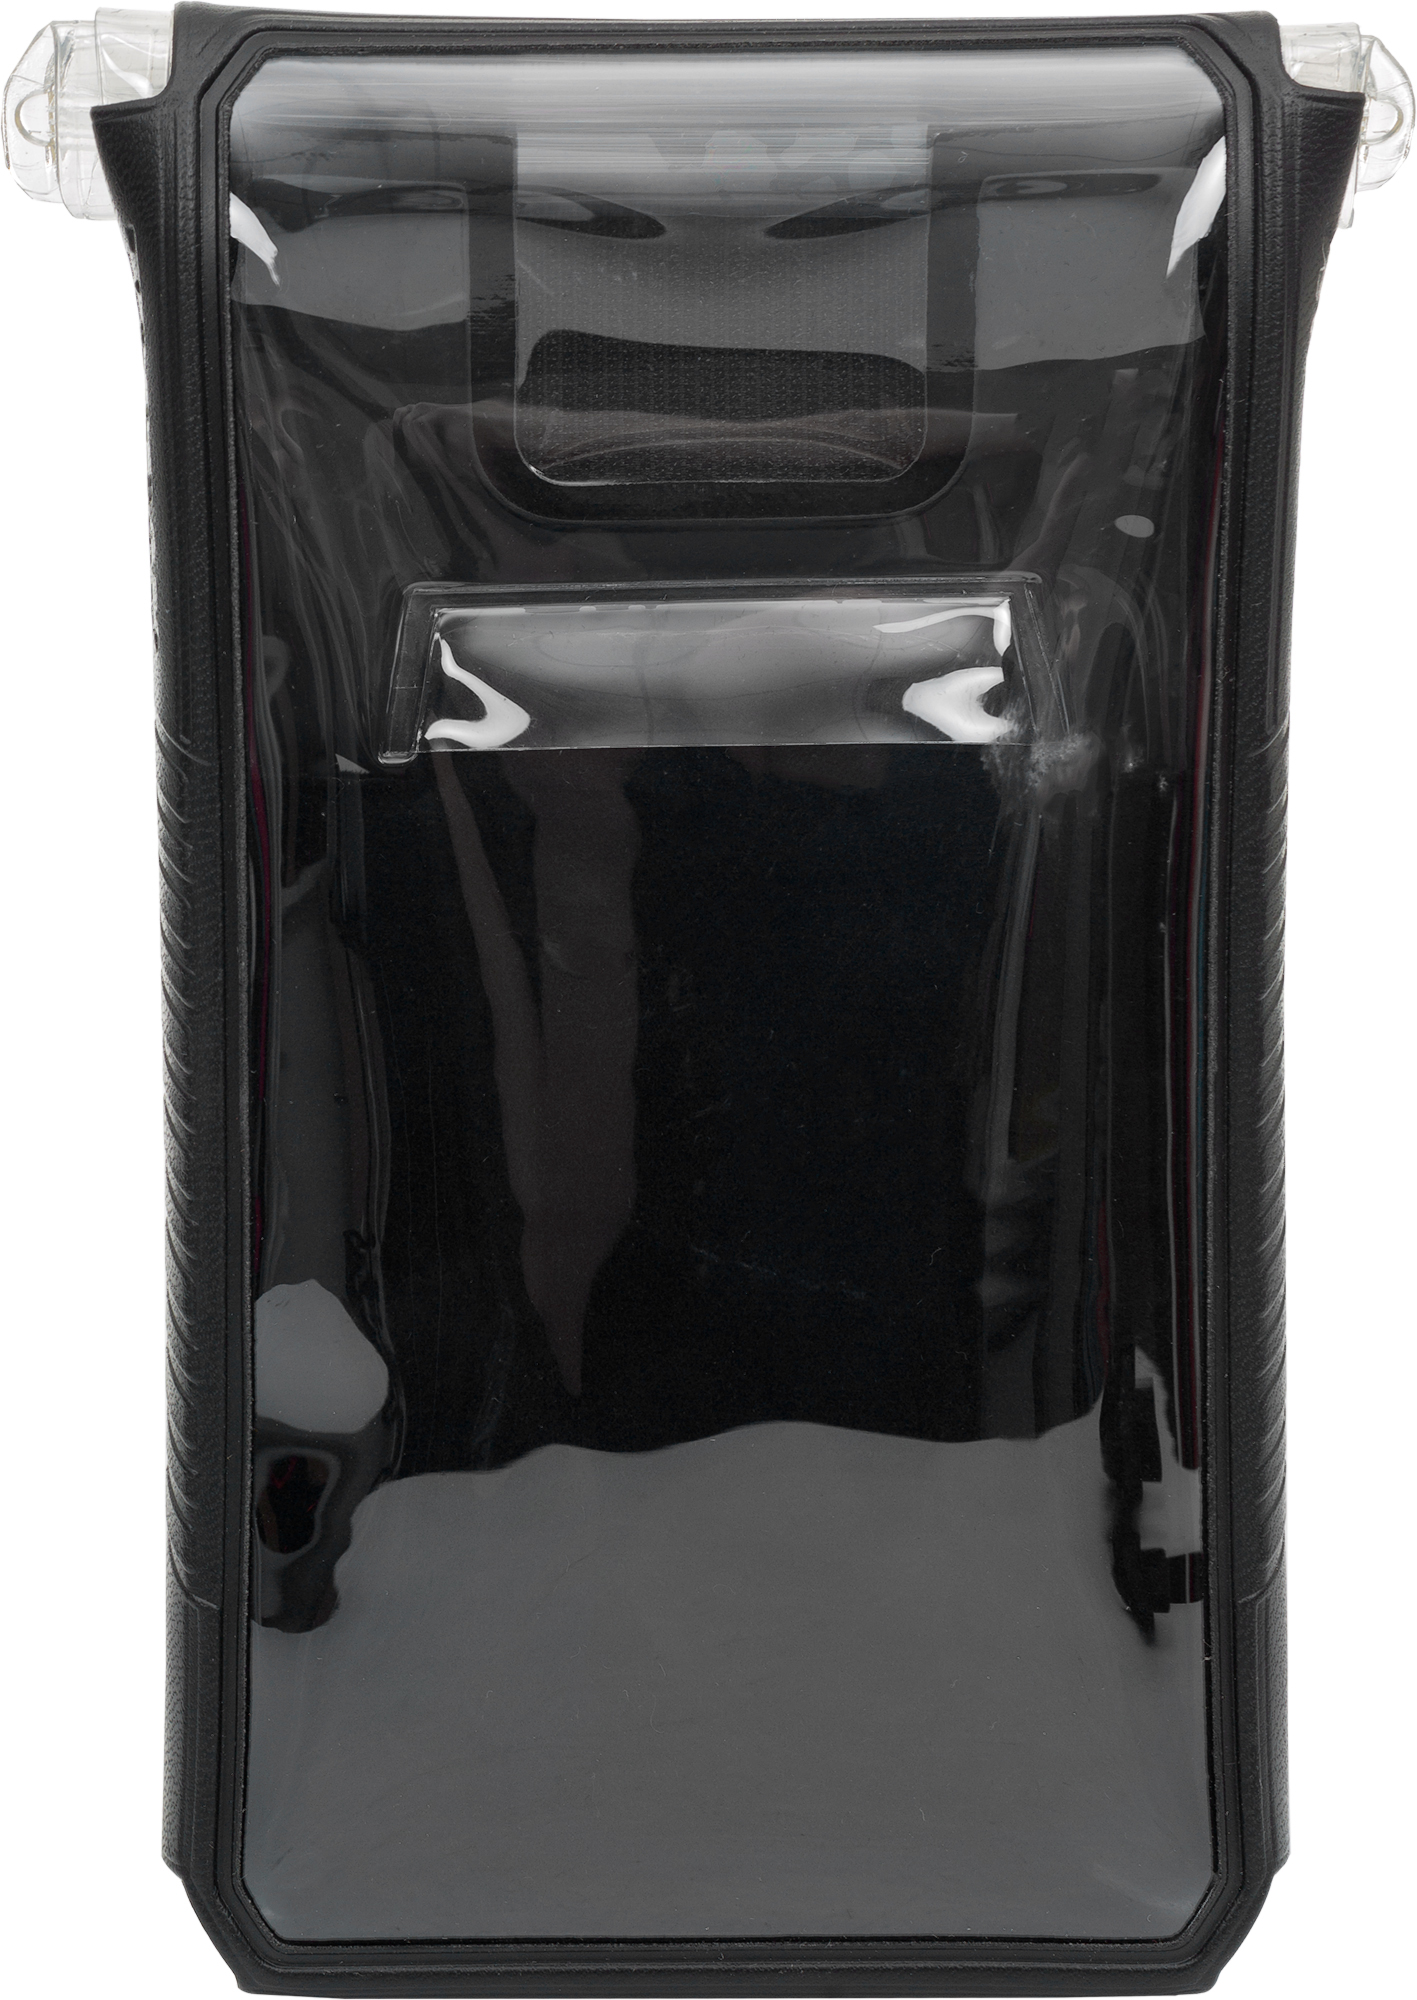 TOPEAK Чехол для смартфона TOPEAK 5-6 аксессуар topeak omni ridecase only fit smartphone from 4 5 to 5 5 inc